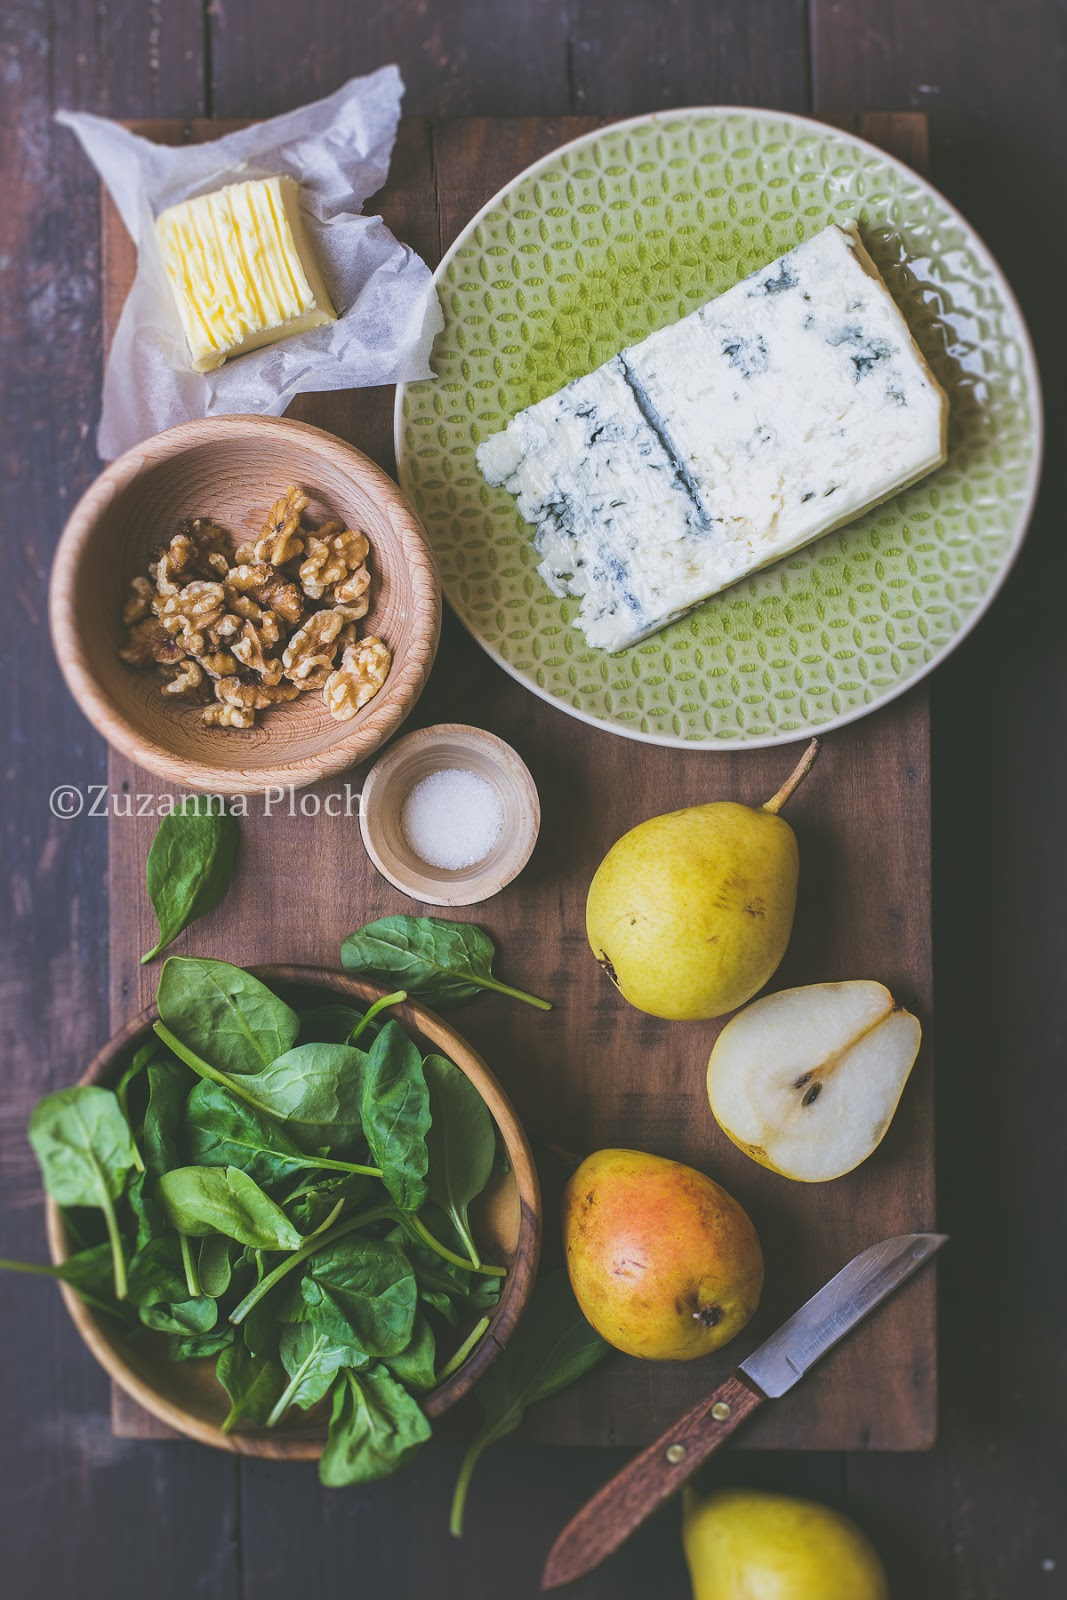 Autumn salad - Food photography by Zuzanna Ploch, fotografia kulinarna